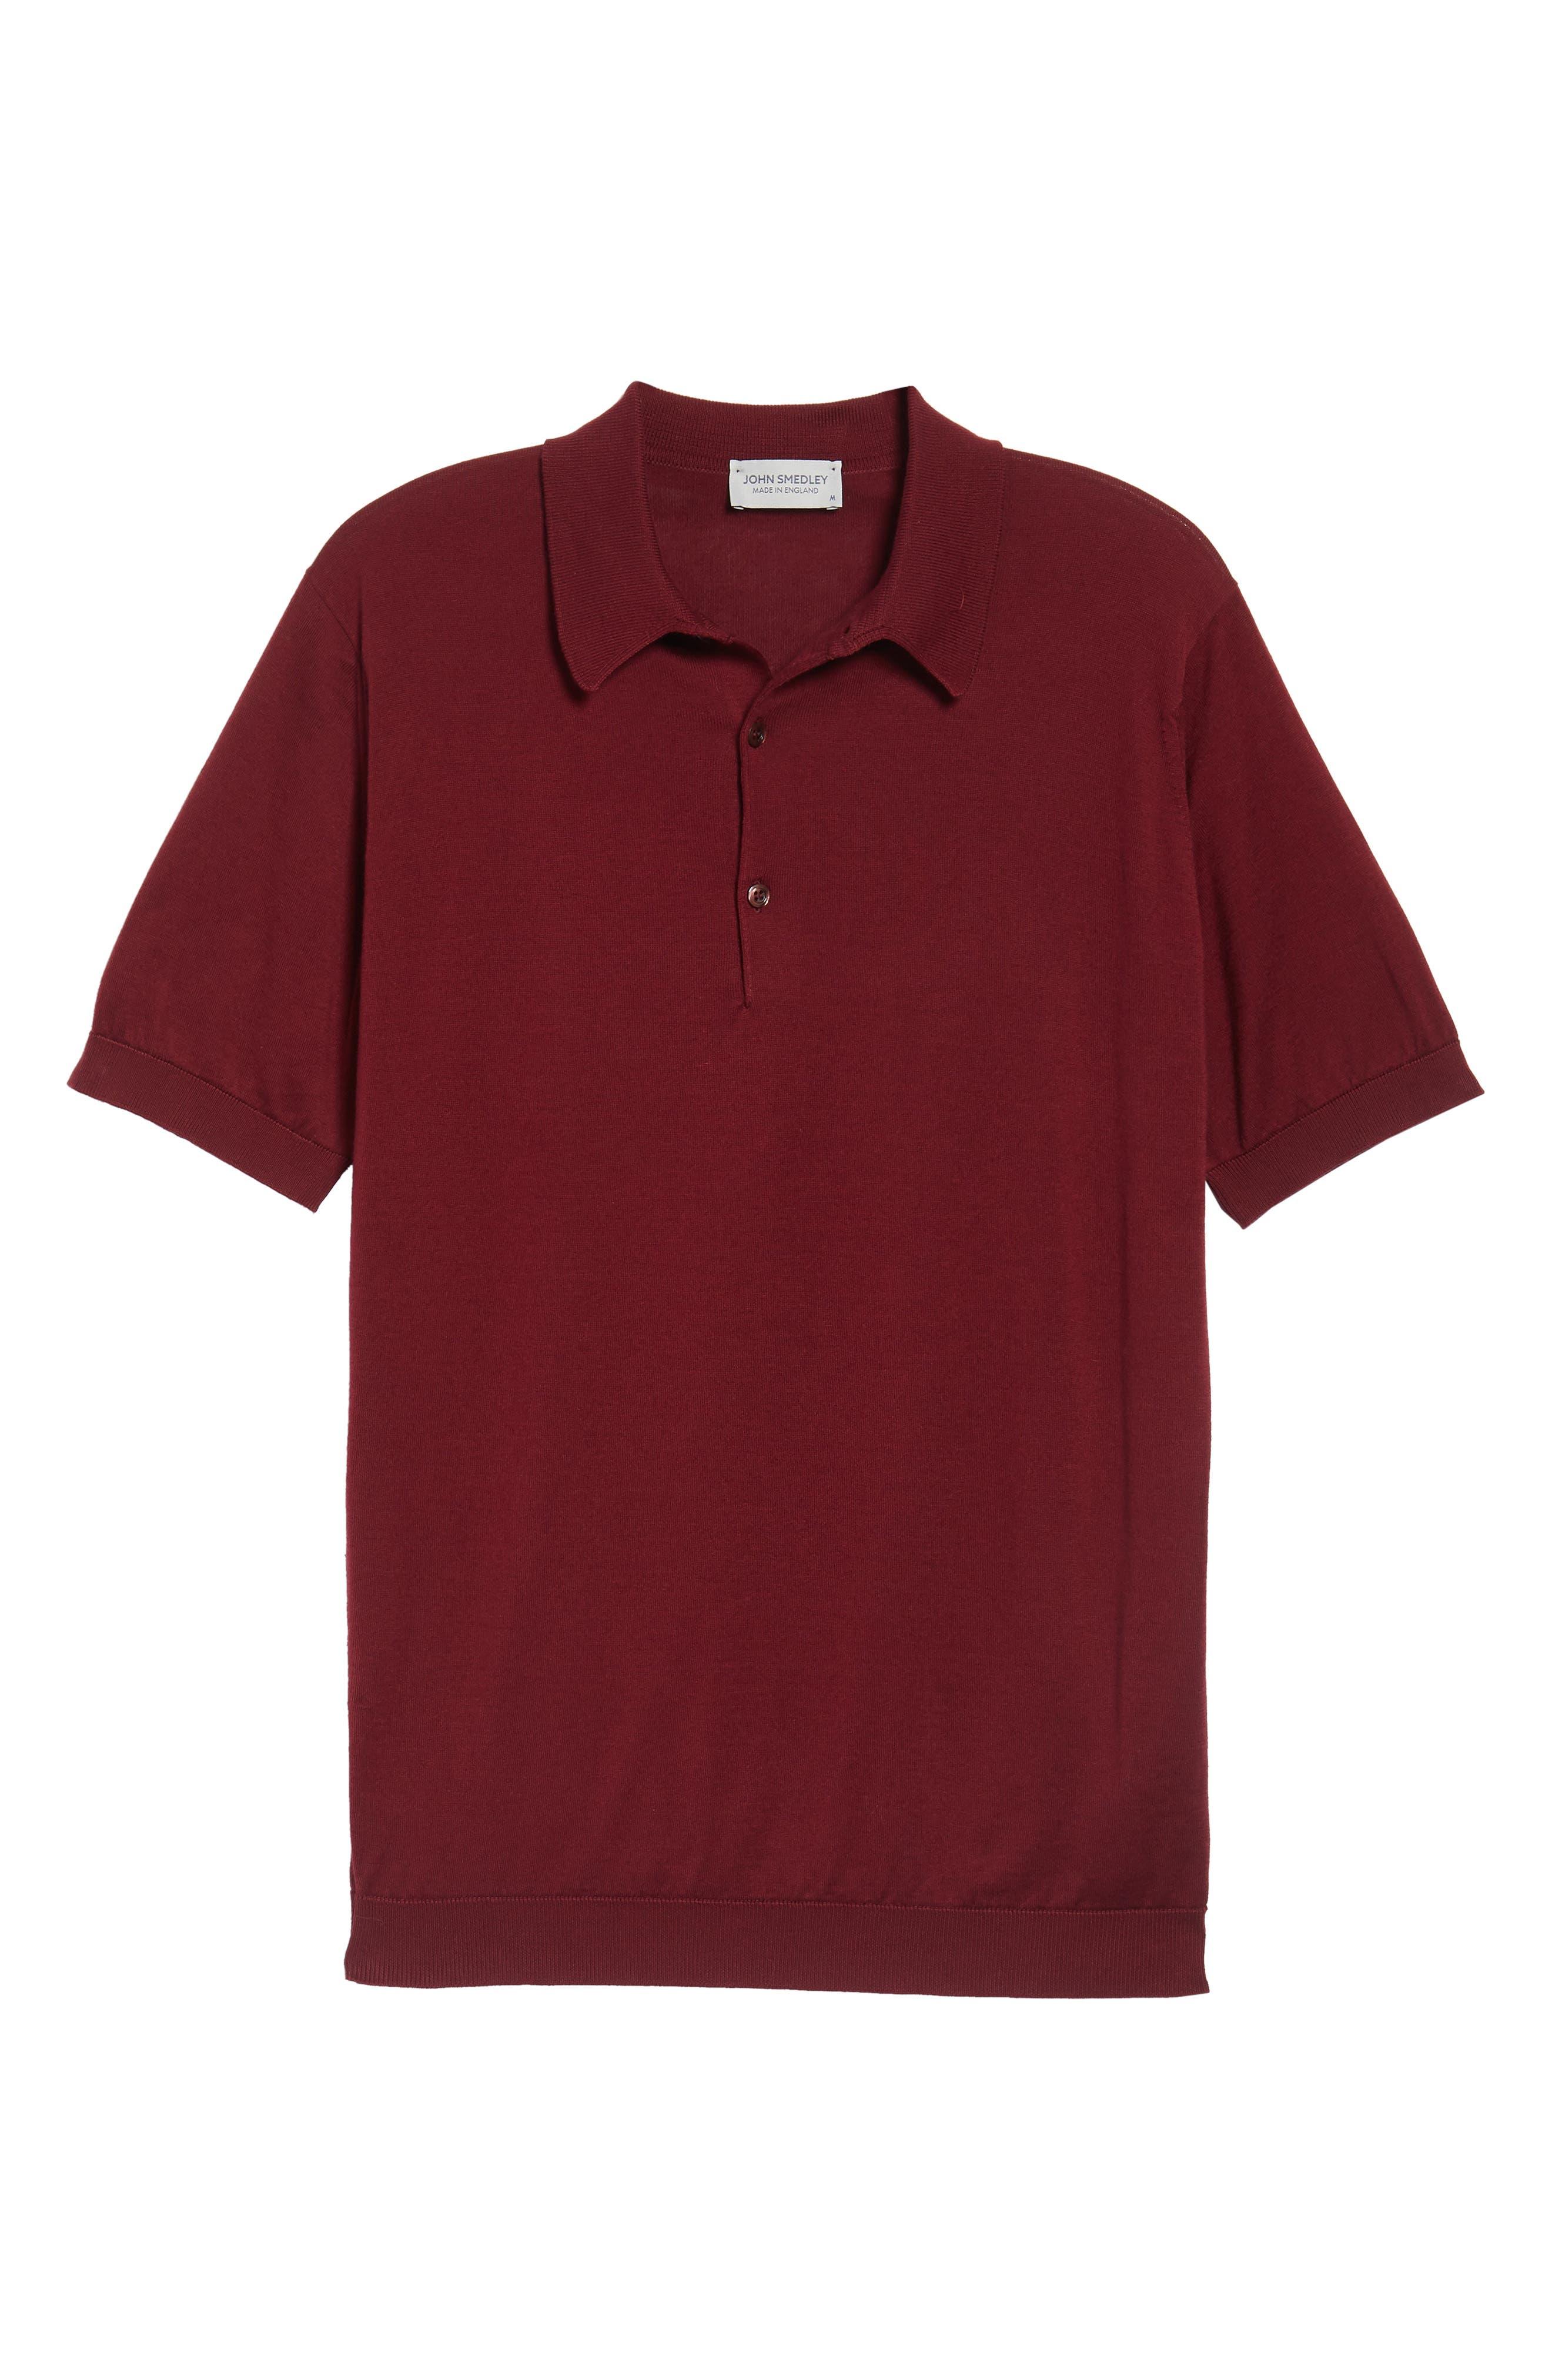 Jersey Polo,                             Alternate thumbnail 6, color,                             Burgundy Grain